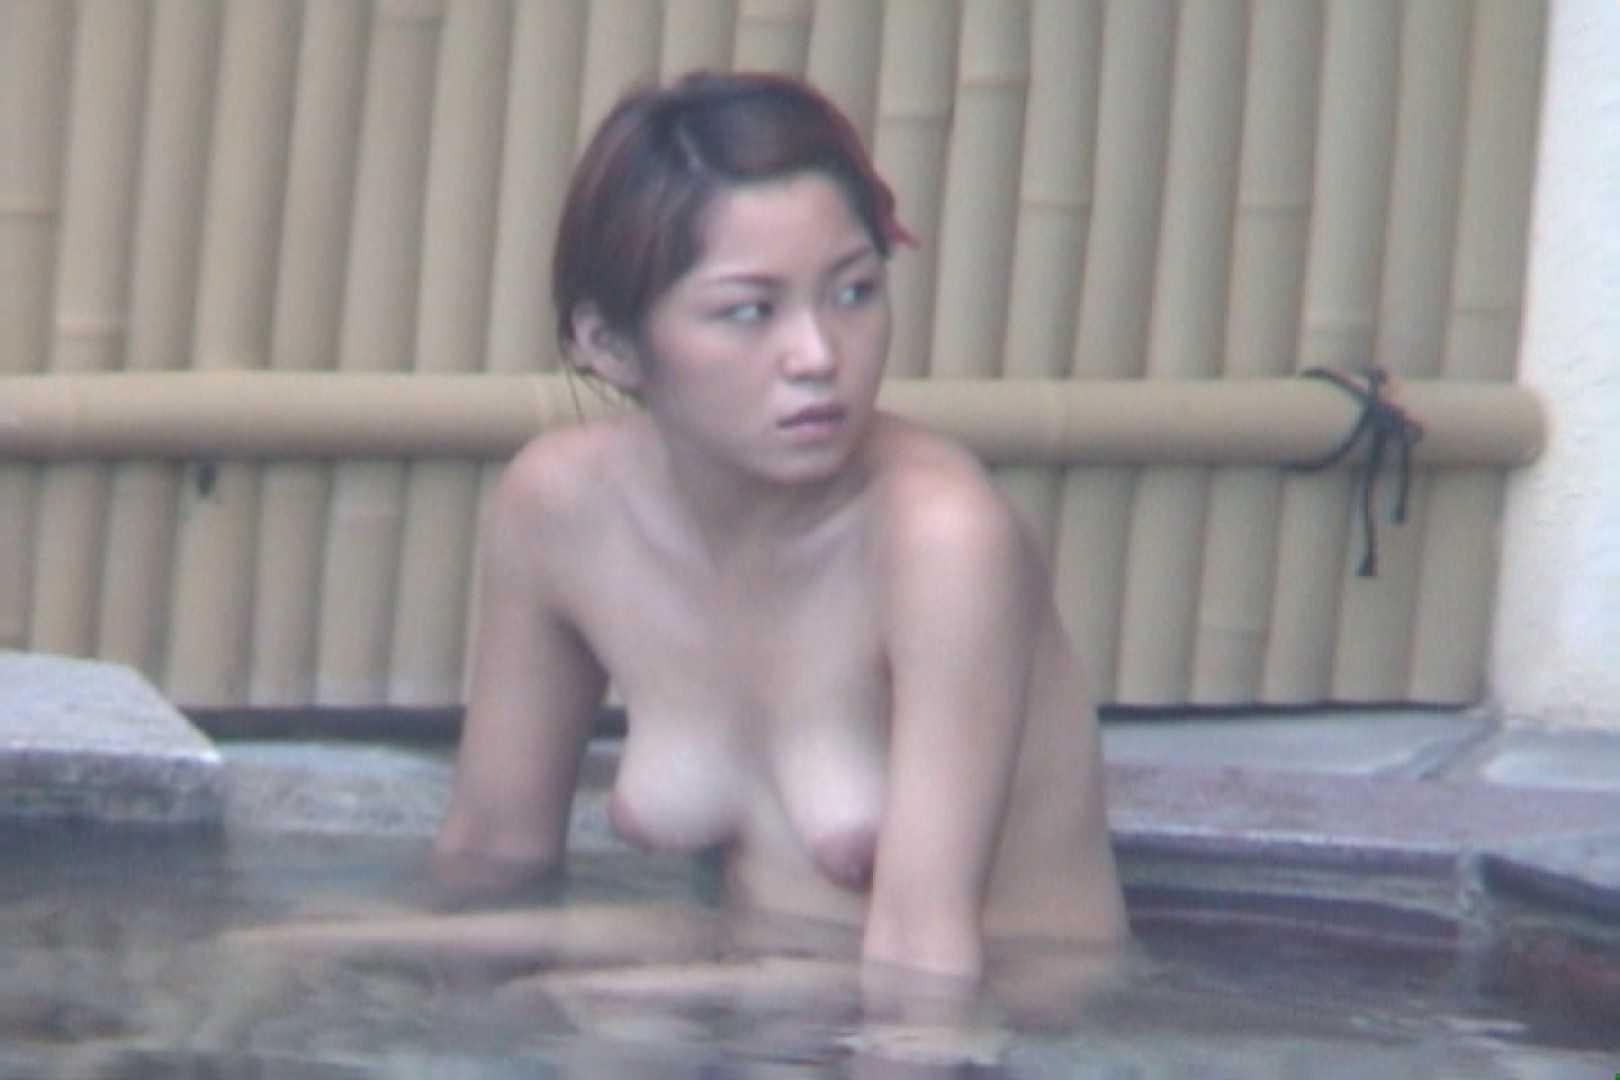 Aquaな露天風呂Vol.574 盗撮  95連発 48